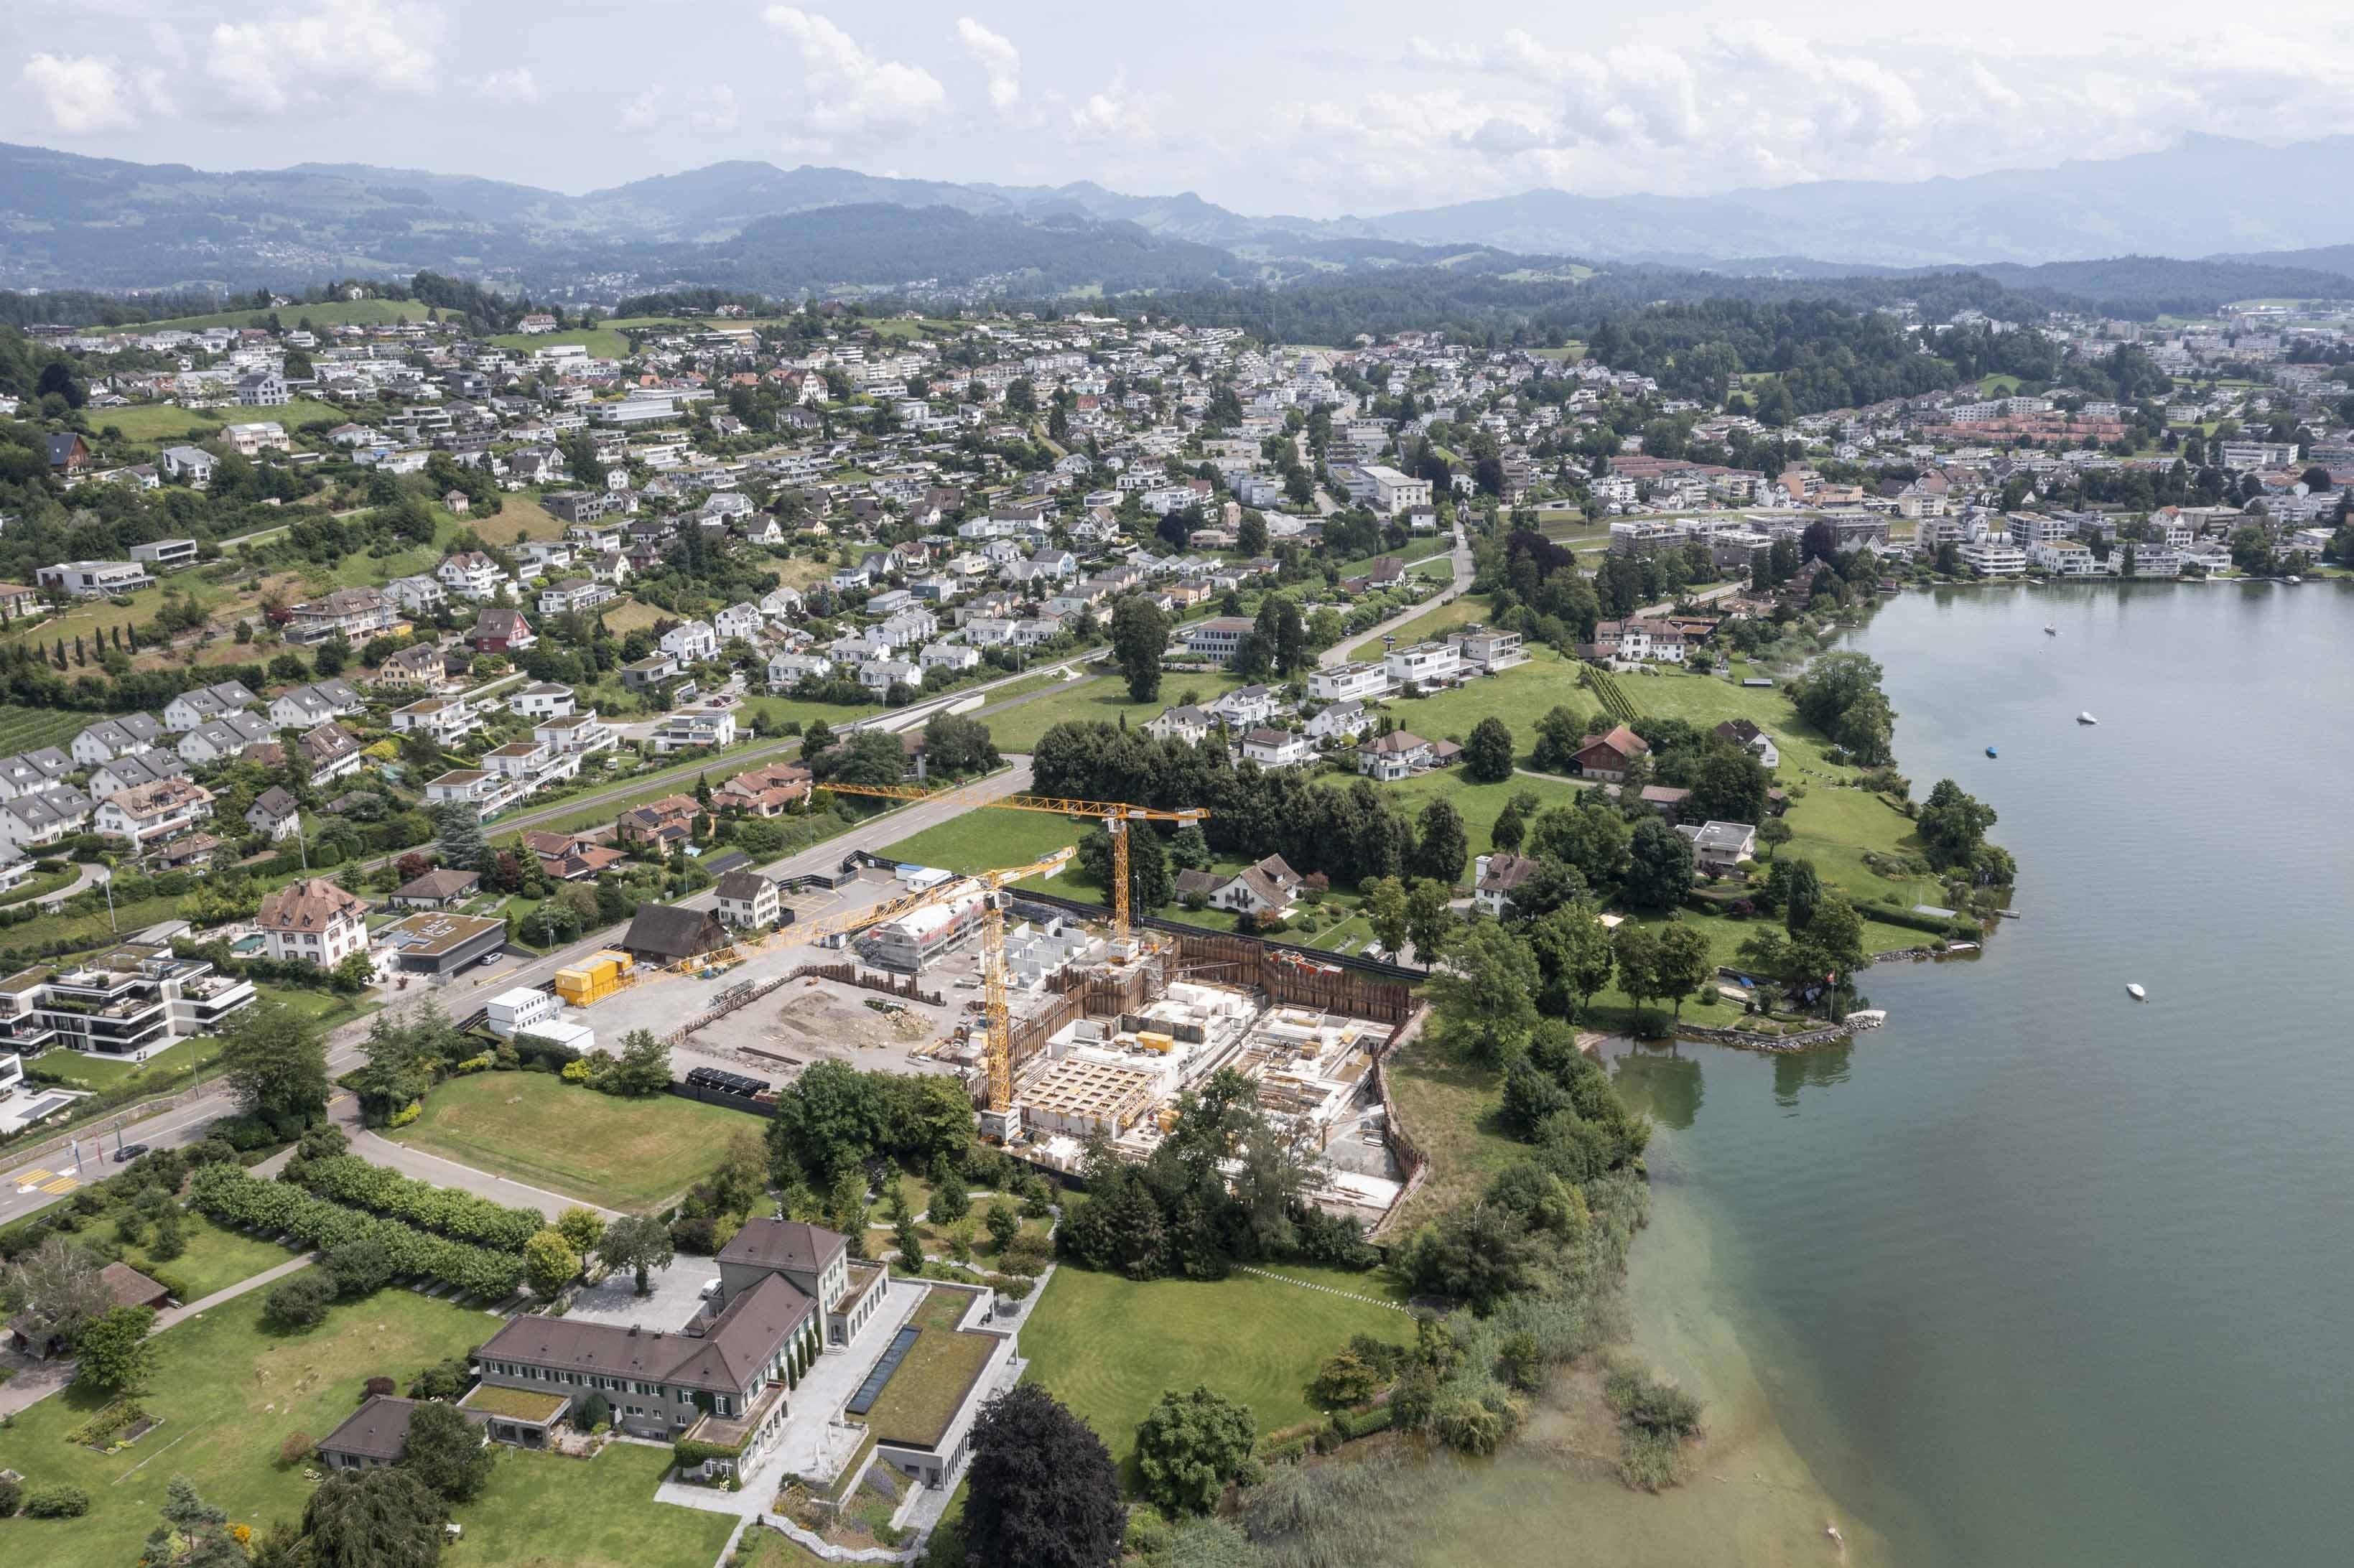 Baustelle von Roger Federer in Rapperswil-Jona